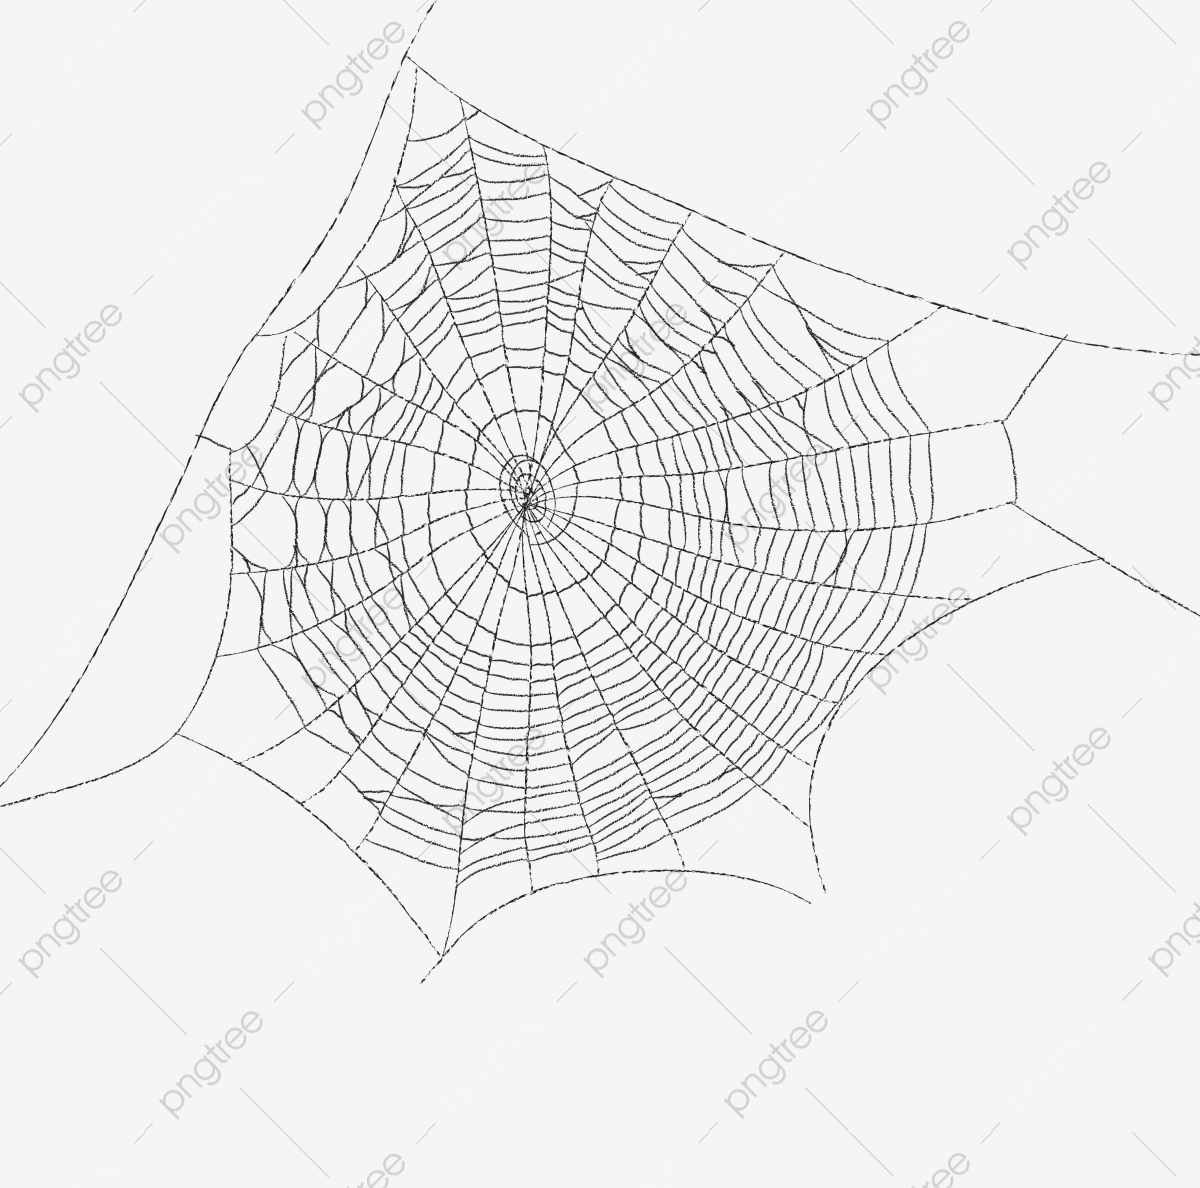 Cobweb, Spider Web Material, Network, Black Spider Web PNG.